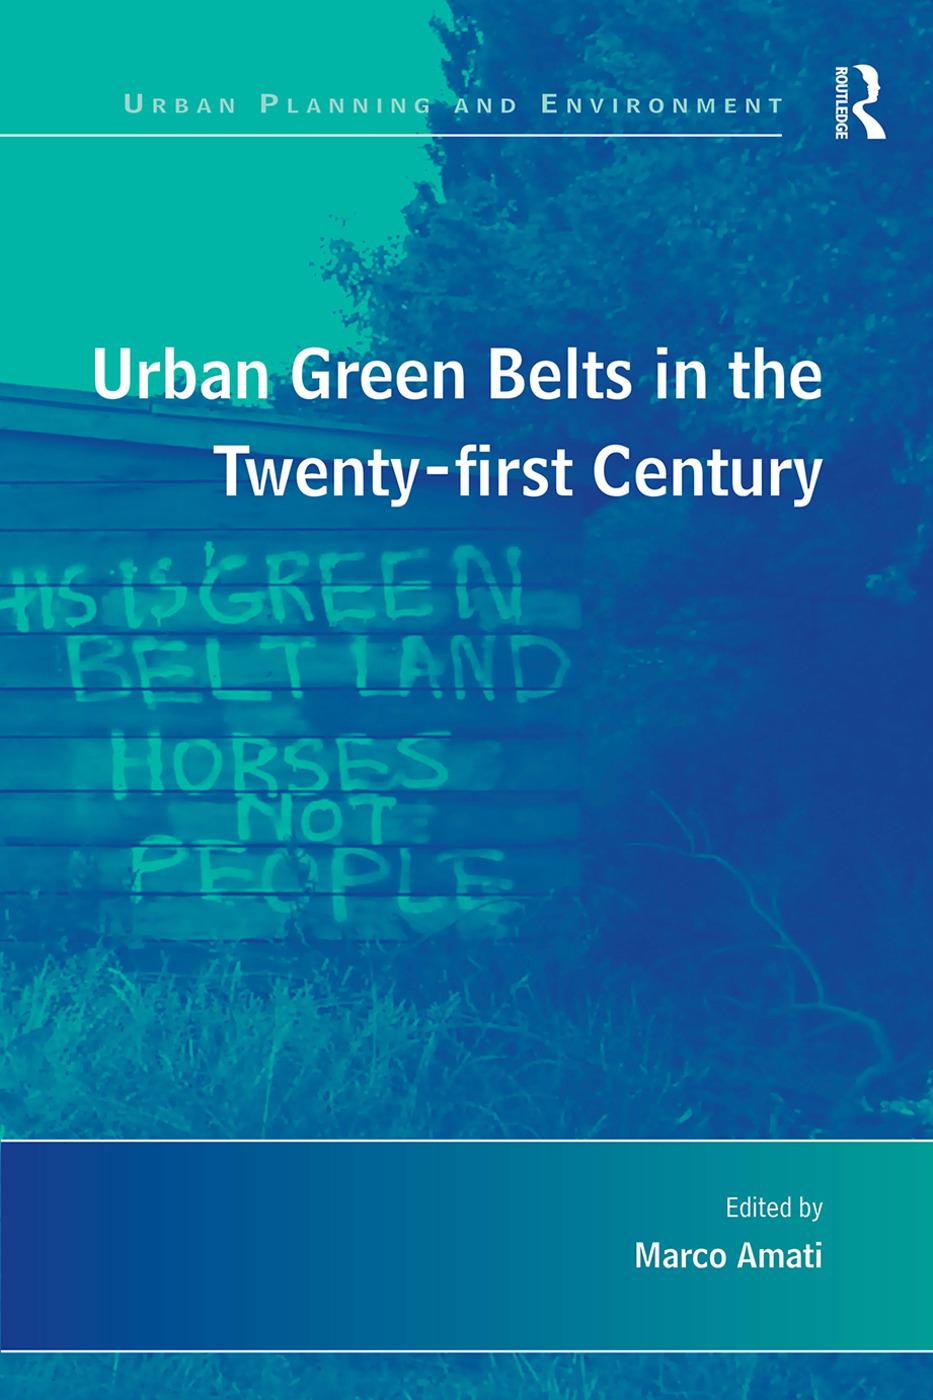 Urban Green Belts in the Twenty-first Century